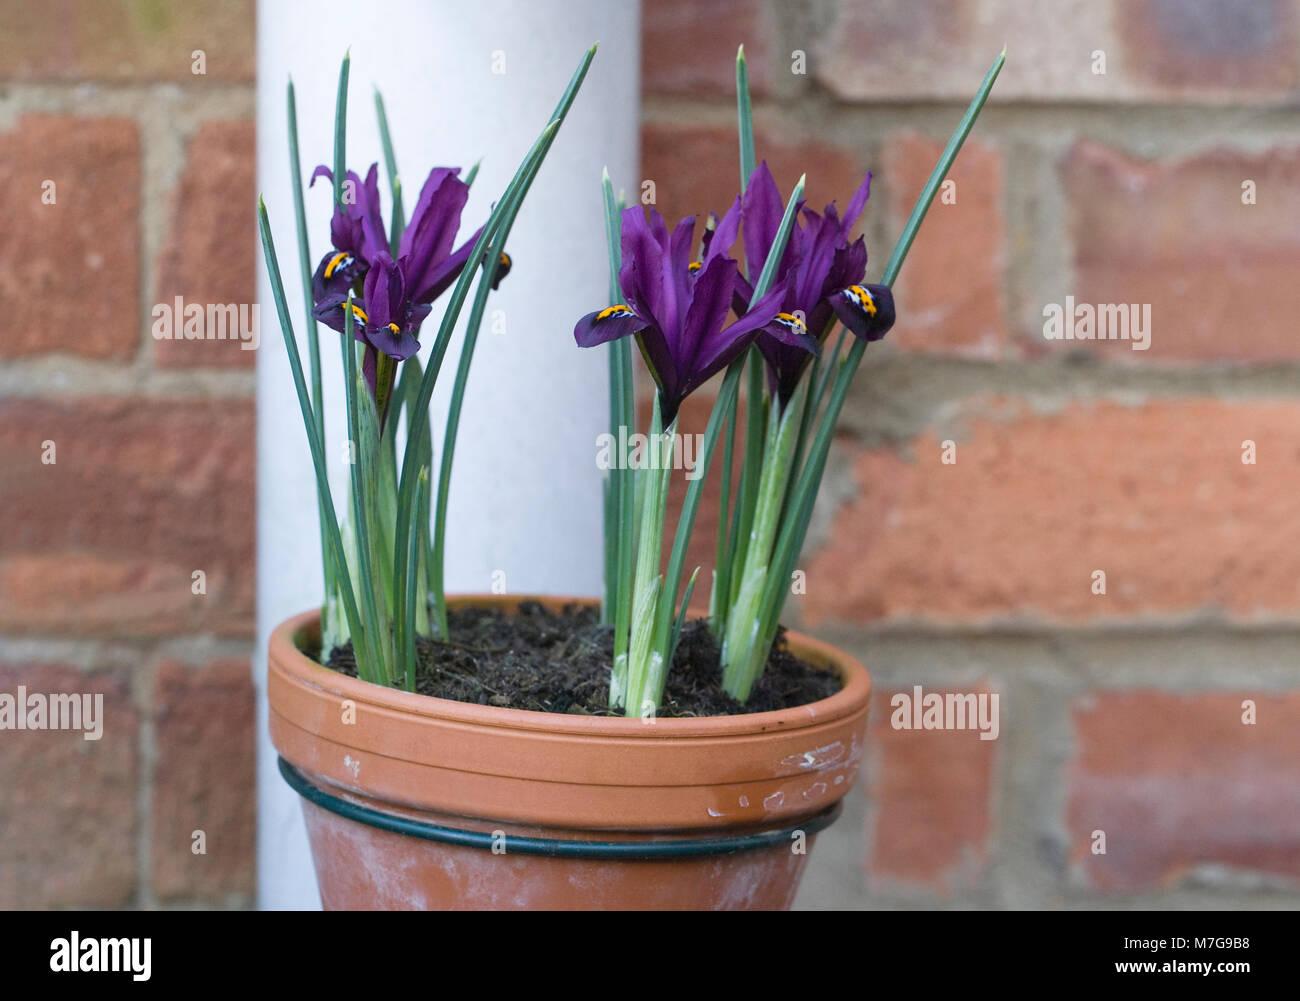 Drainpipe pot holders. Iris reticulata flowers. - Stock Image